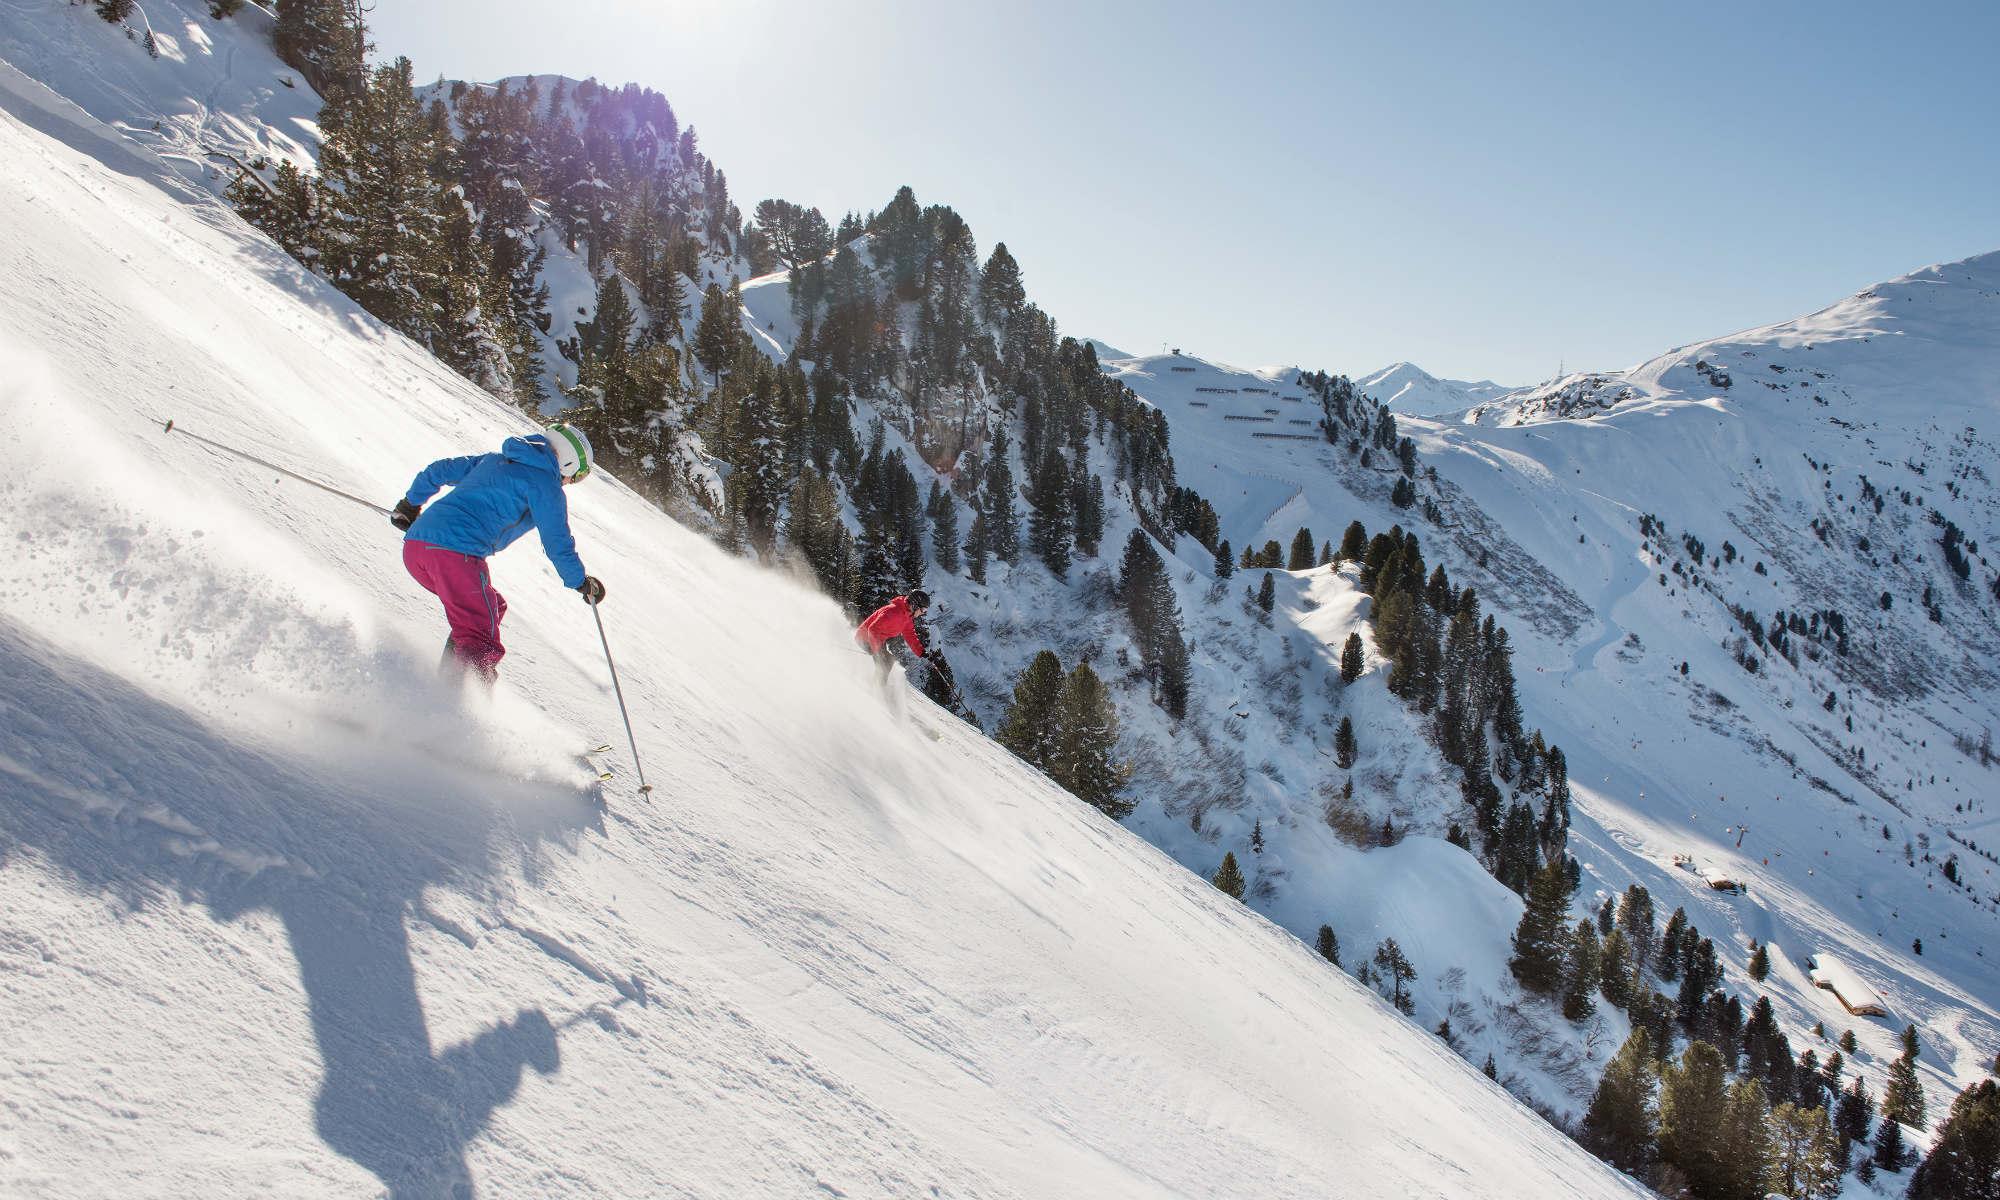 How to Ski Black Diamonds Instructions